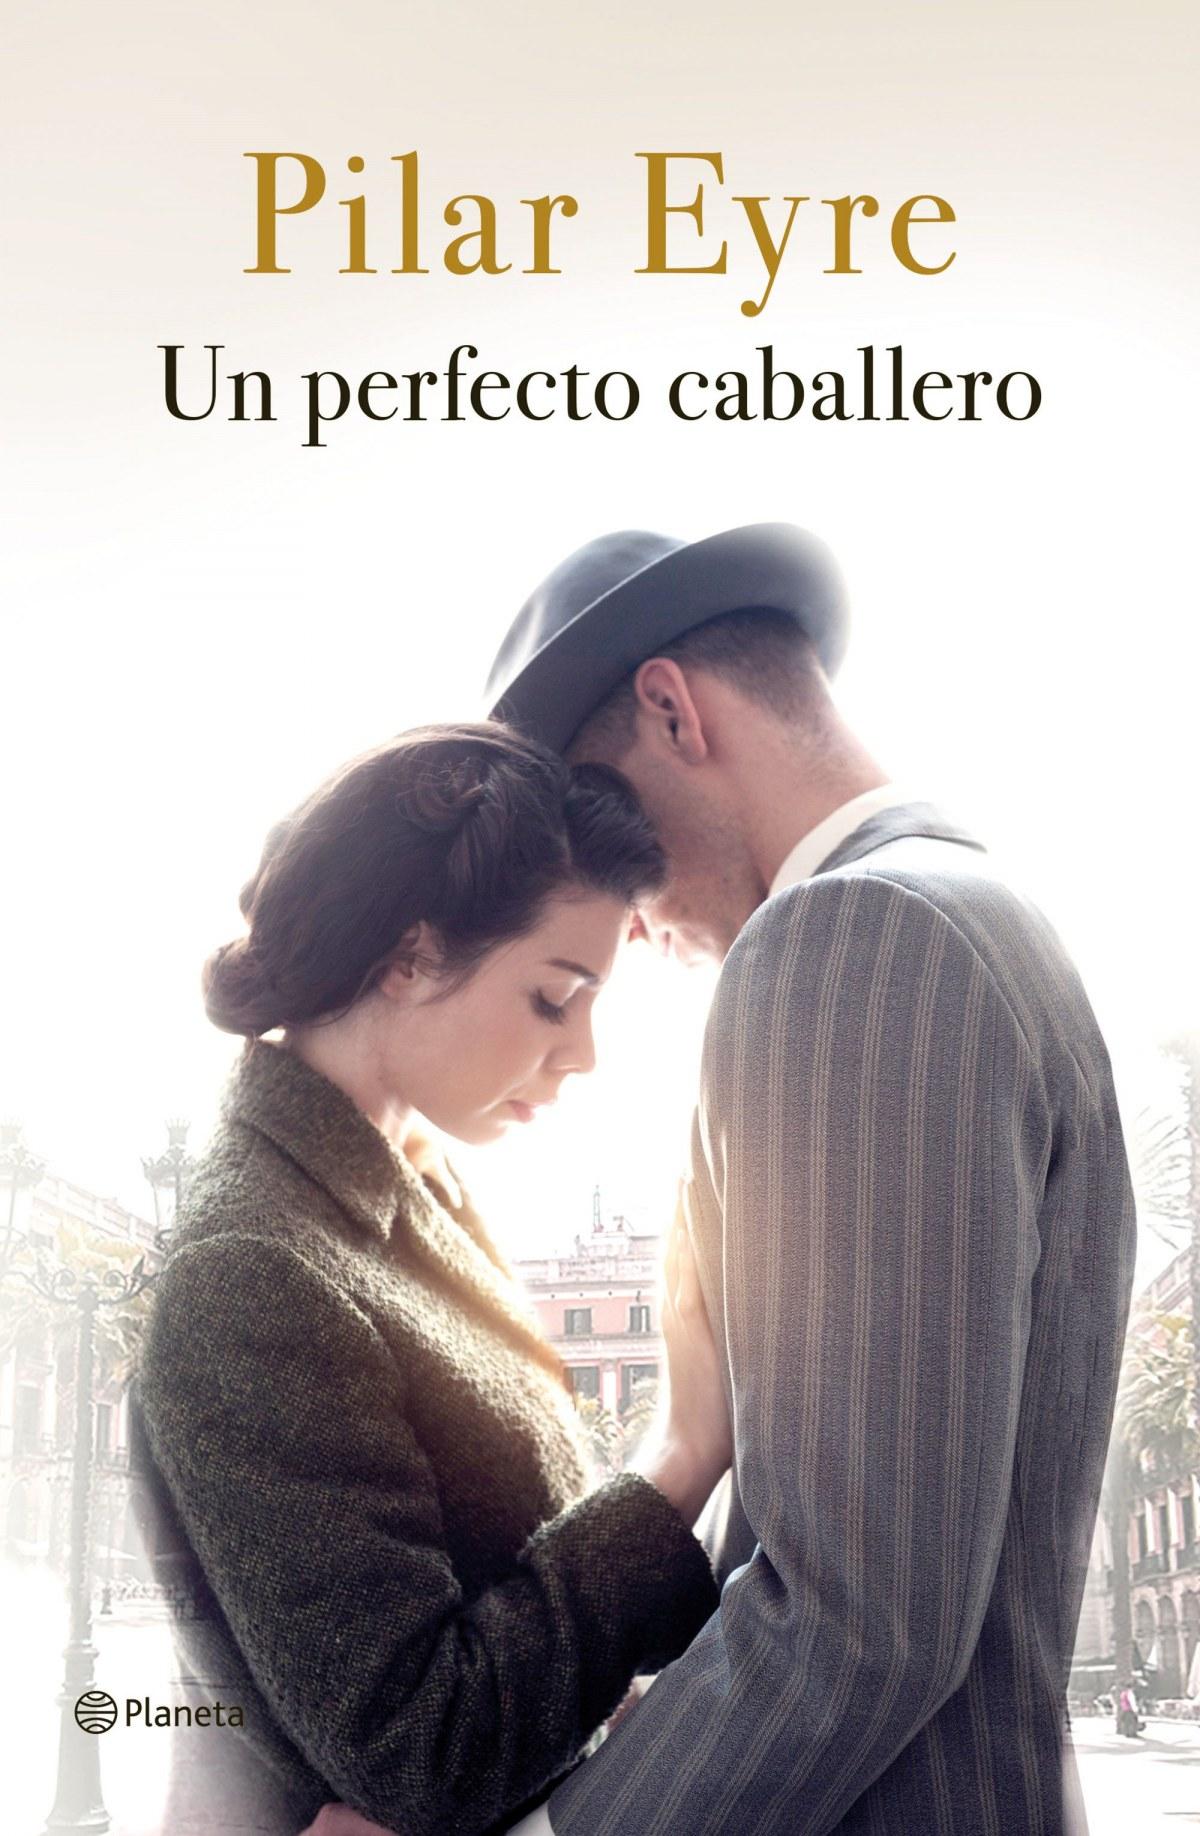 Perfecto caballero 9788408215615